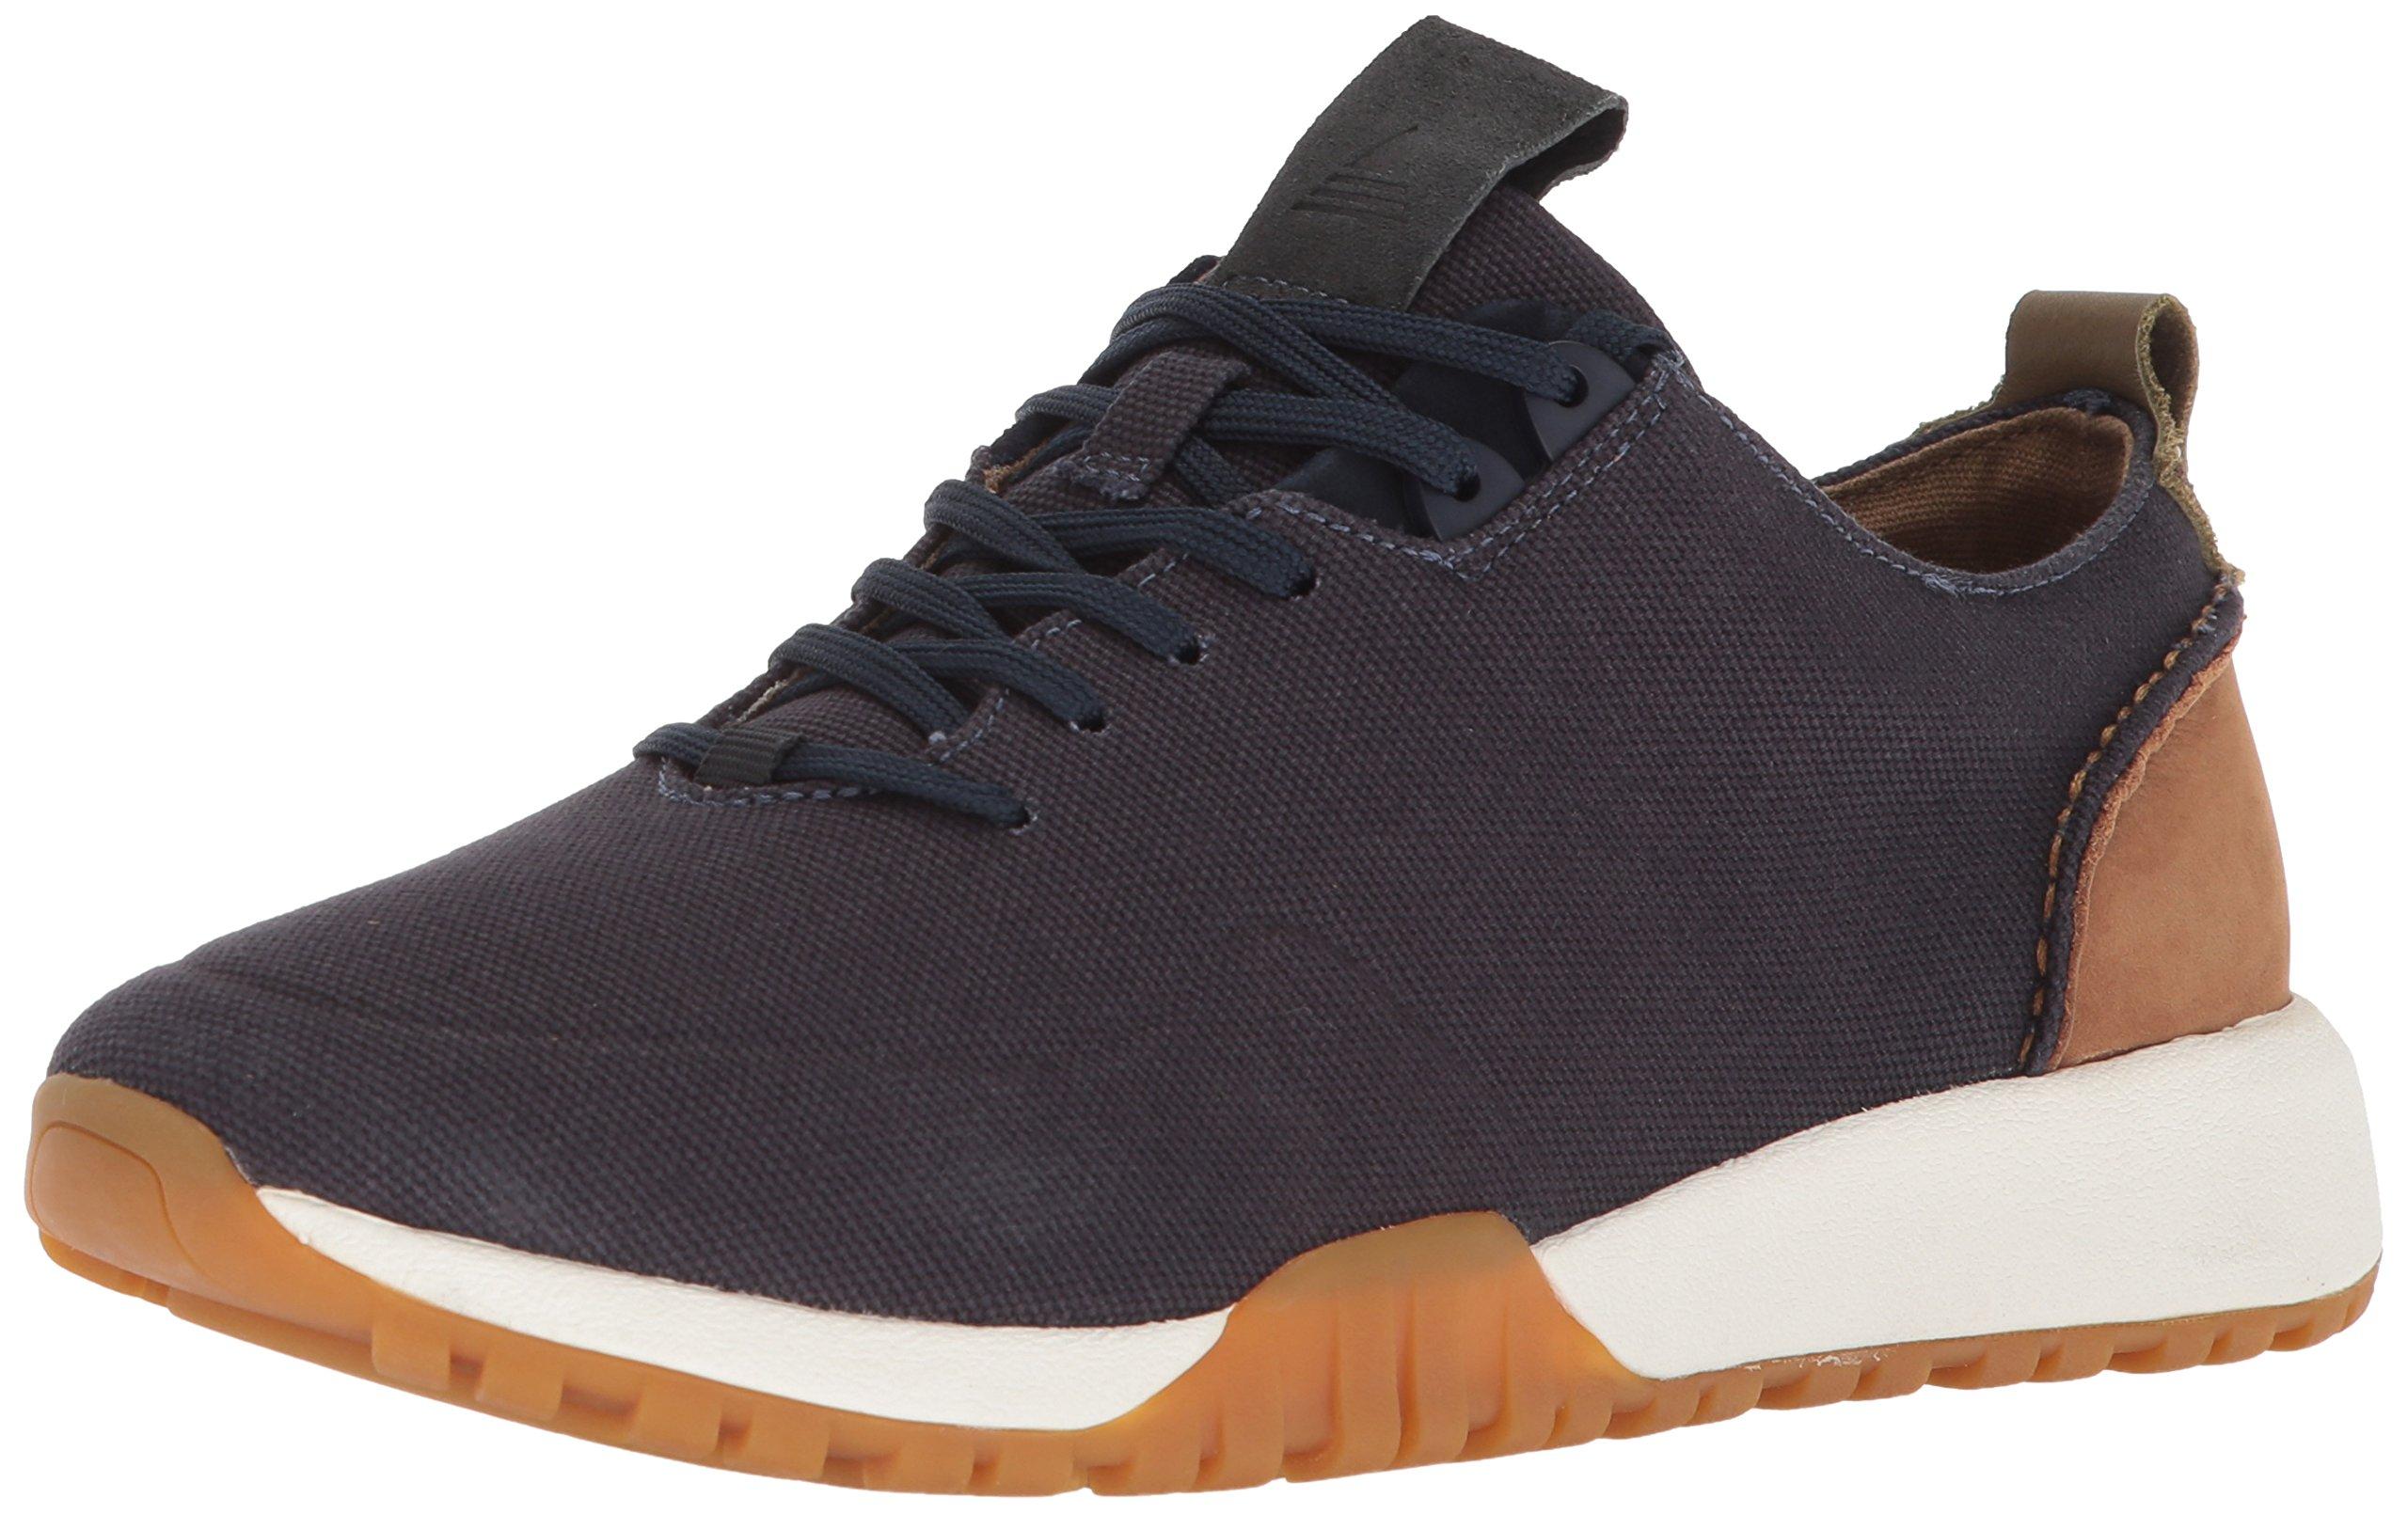 ALDO Men's Relle Fashion Sneaker, Navy, 10 D US